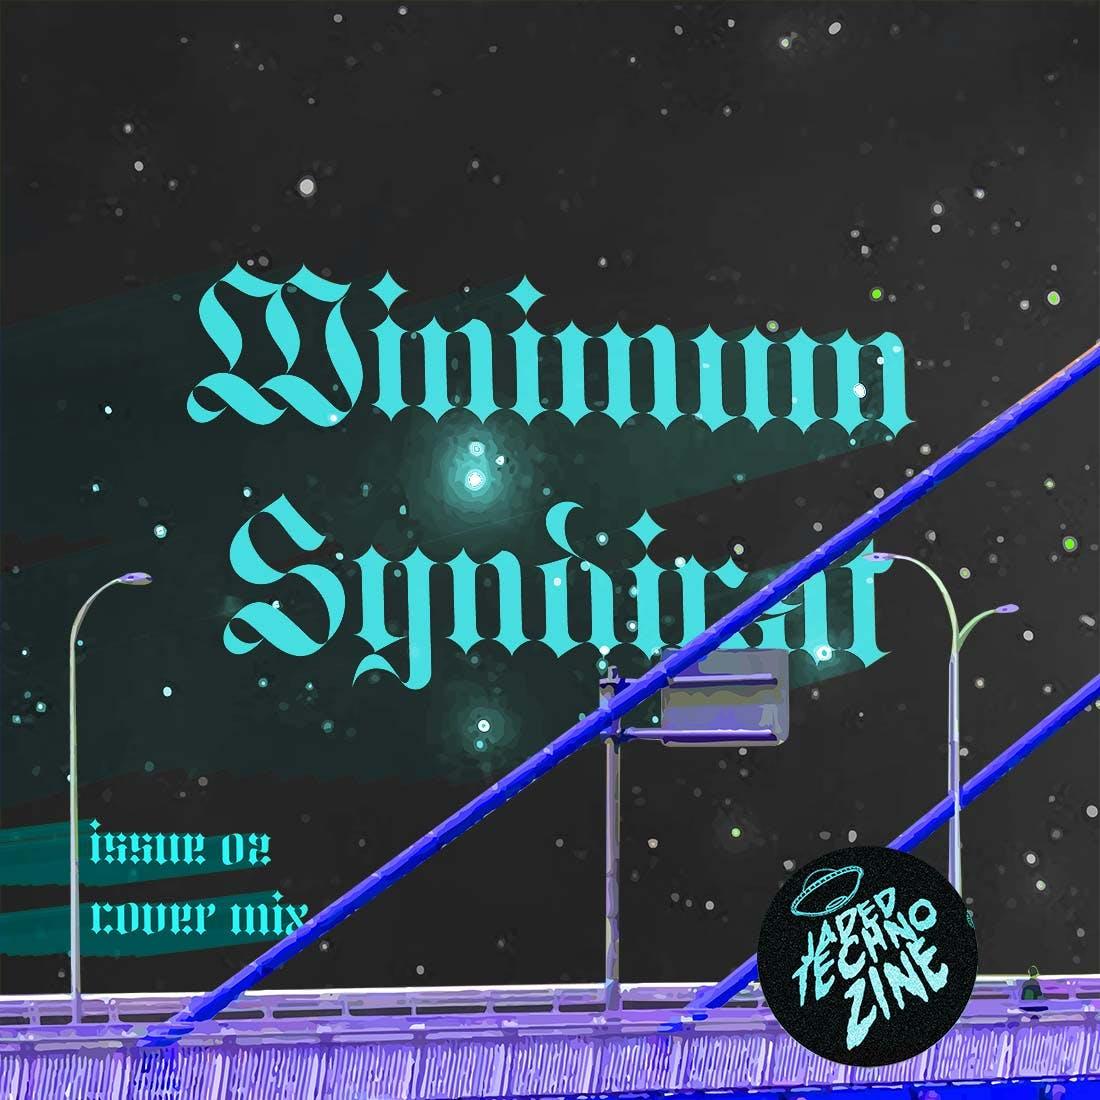 Cover Mix: Minimum Syndicat